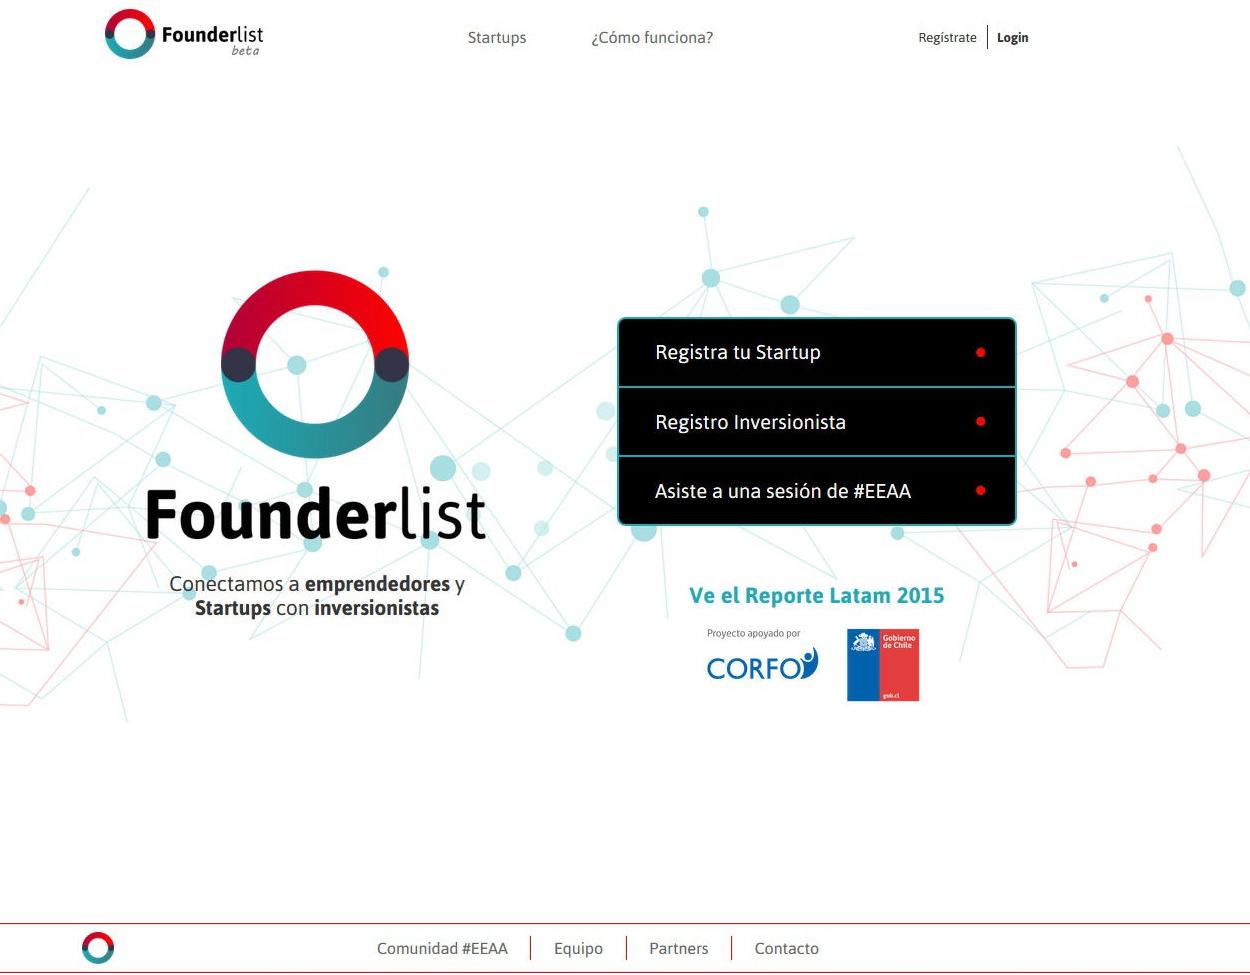 Founderlist App Screenshot: Landing section